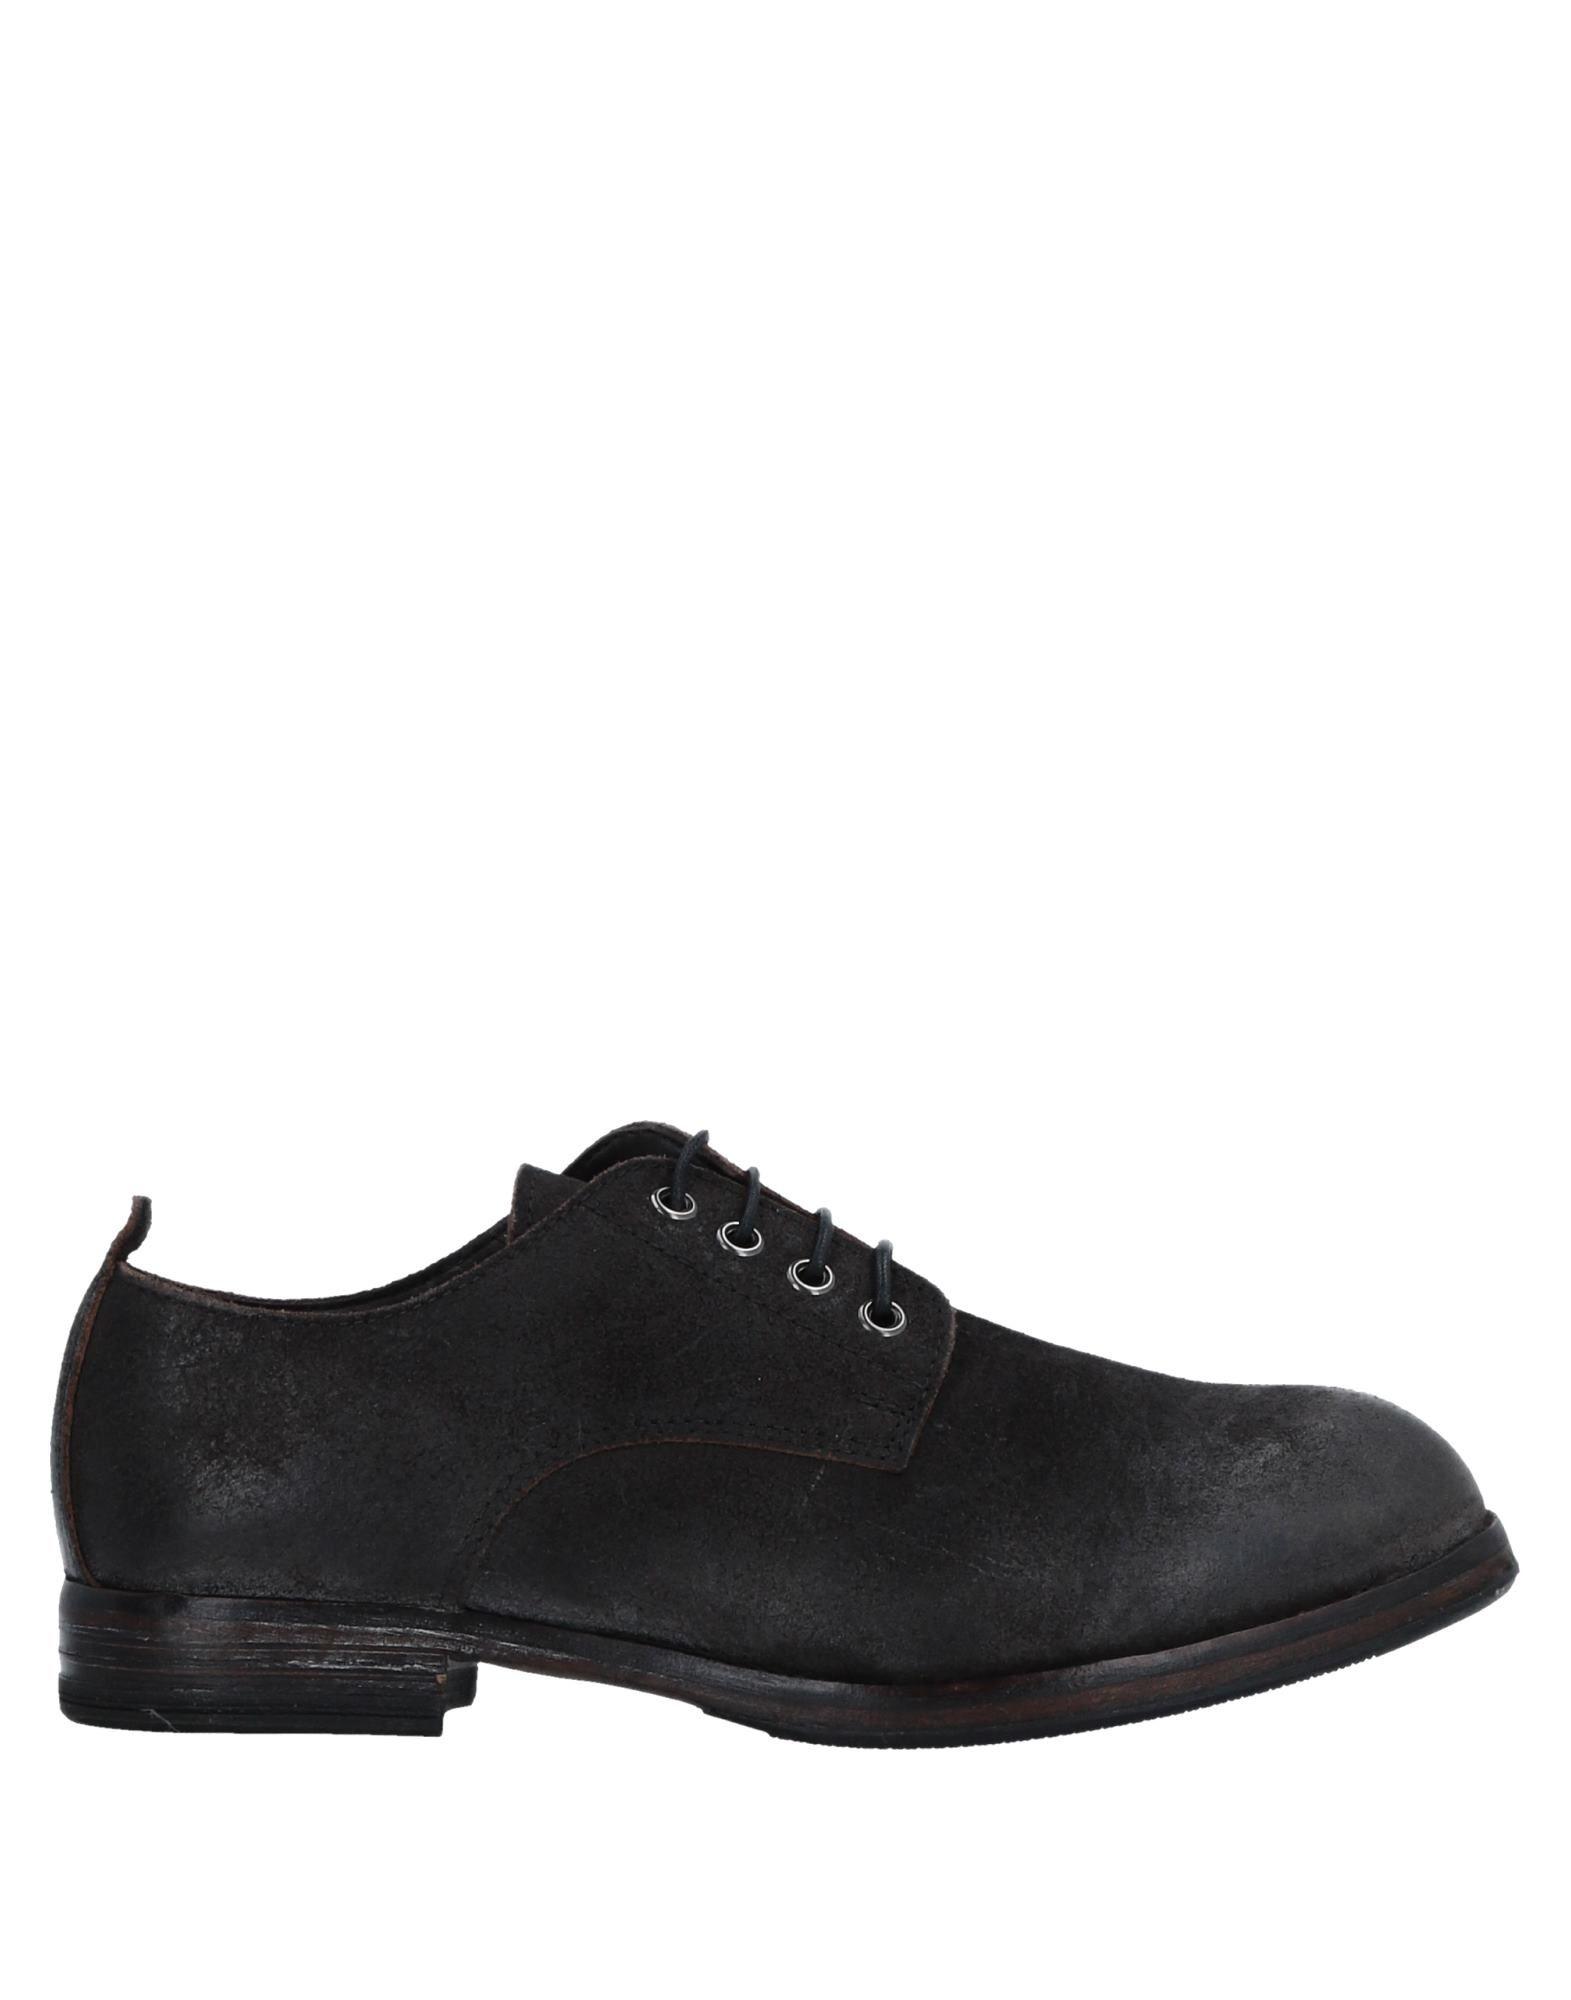 Moma Schnürschuhe Damen  11516640NT Gute Qualität beliebte Schuhe